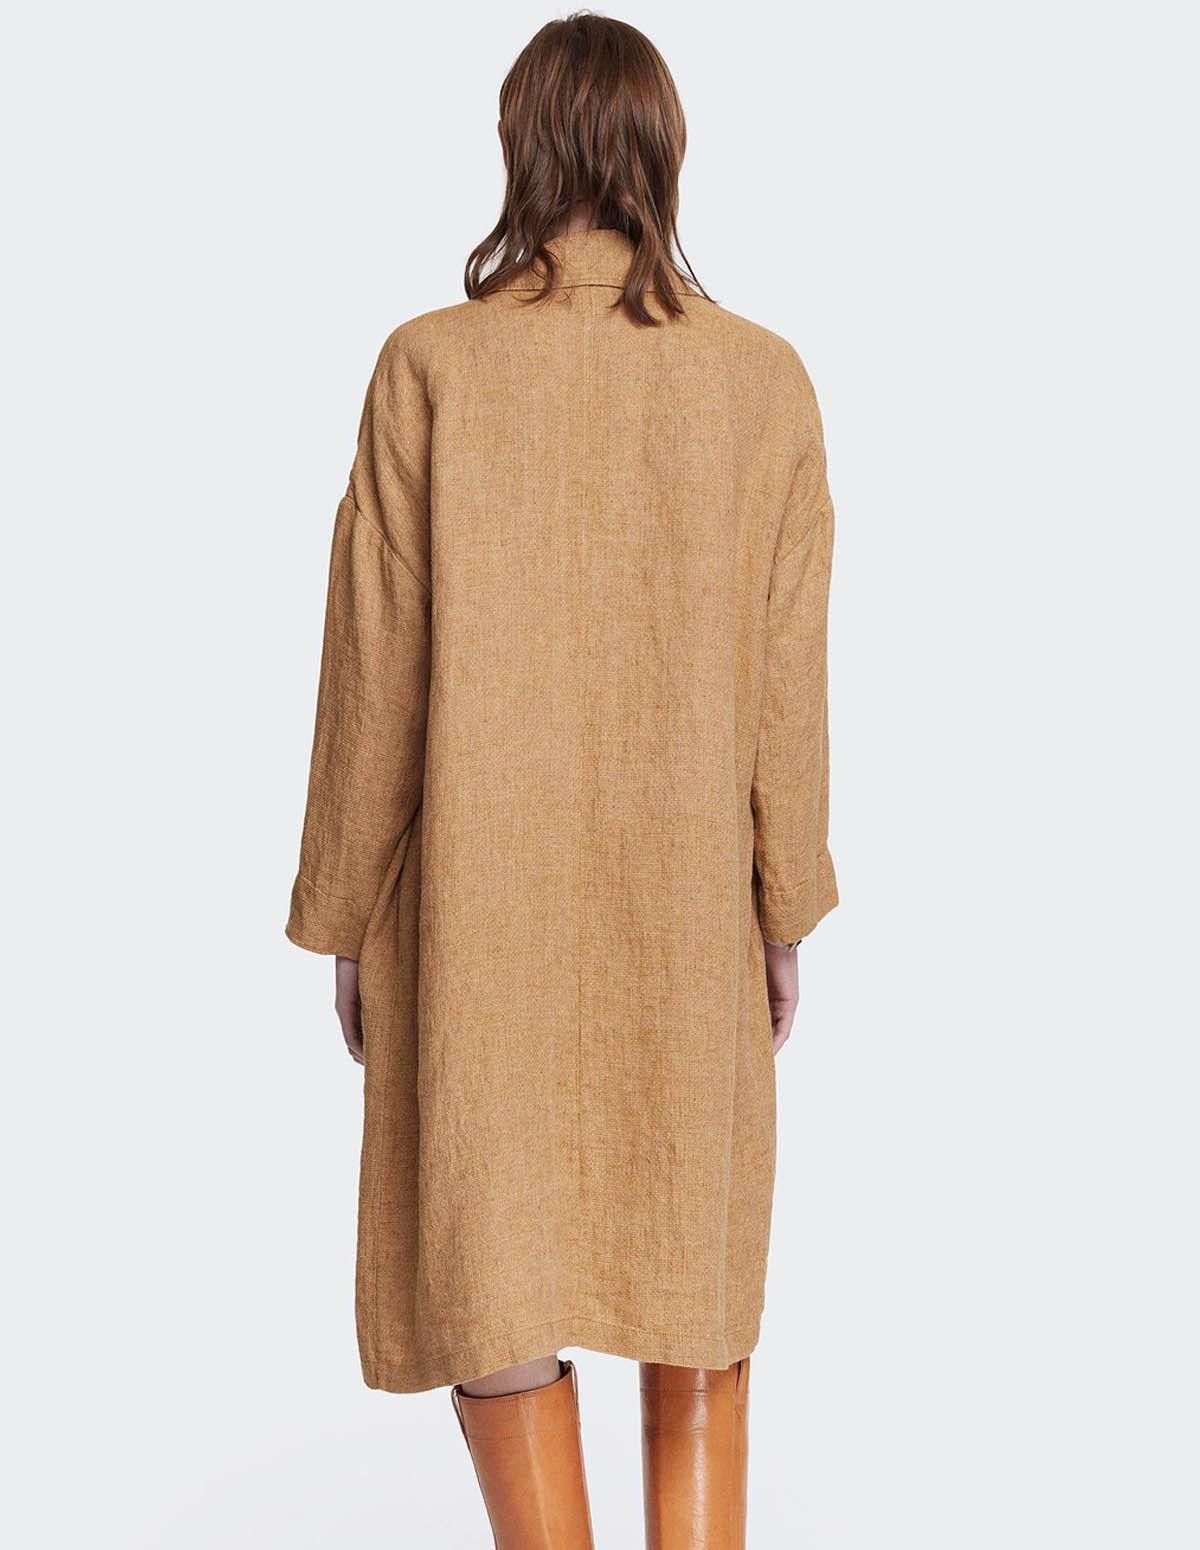 Pom 6142/50767 Coat